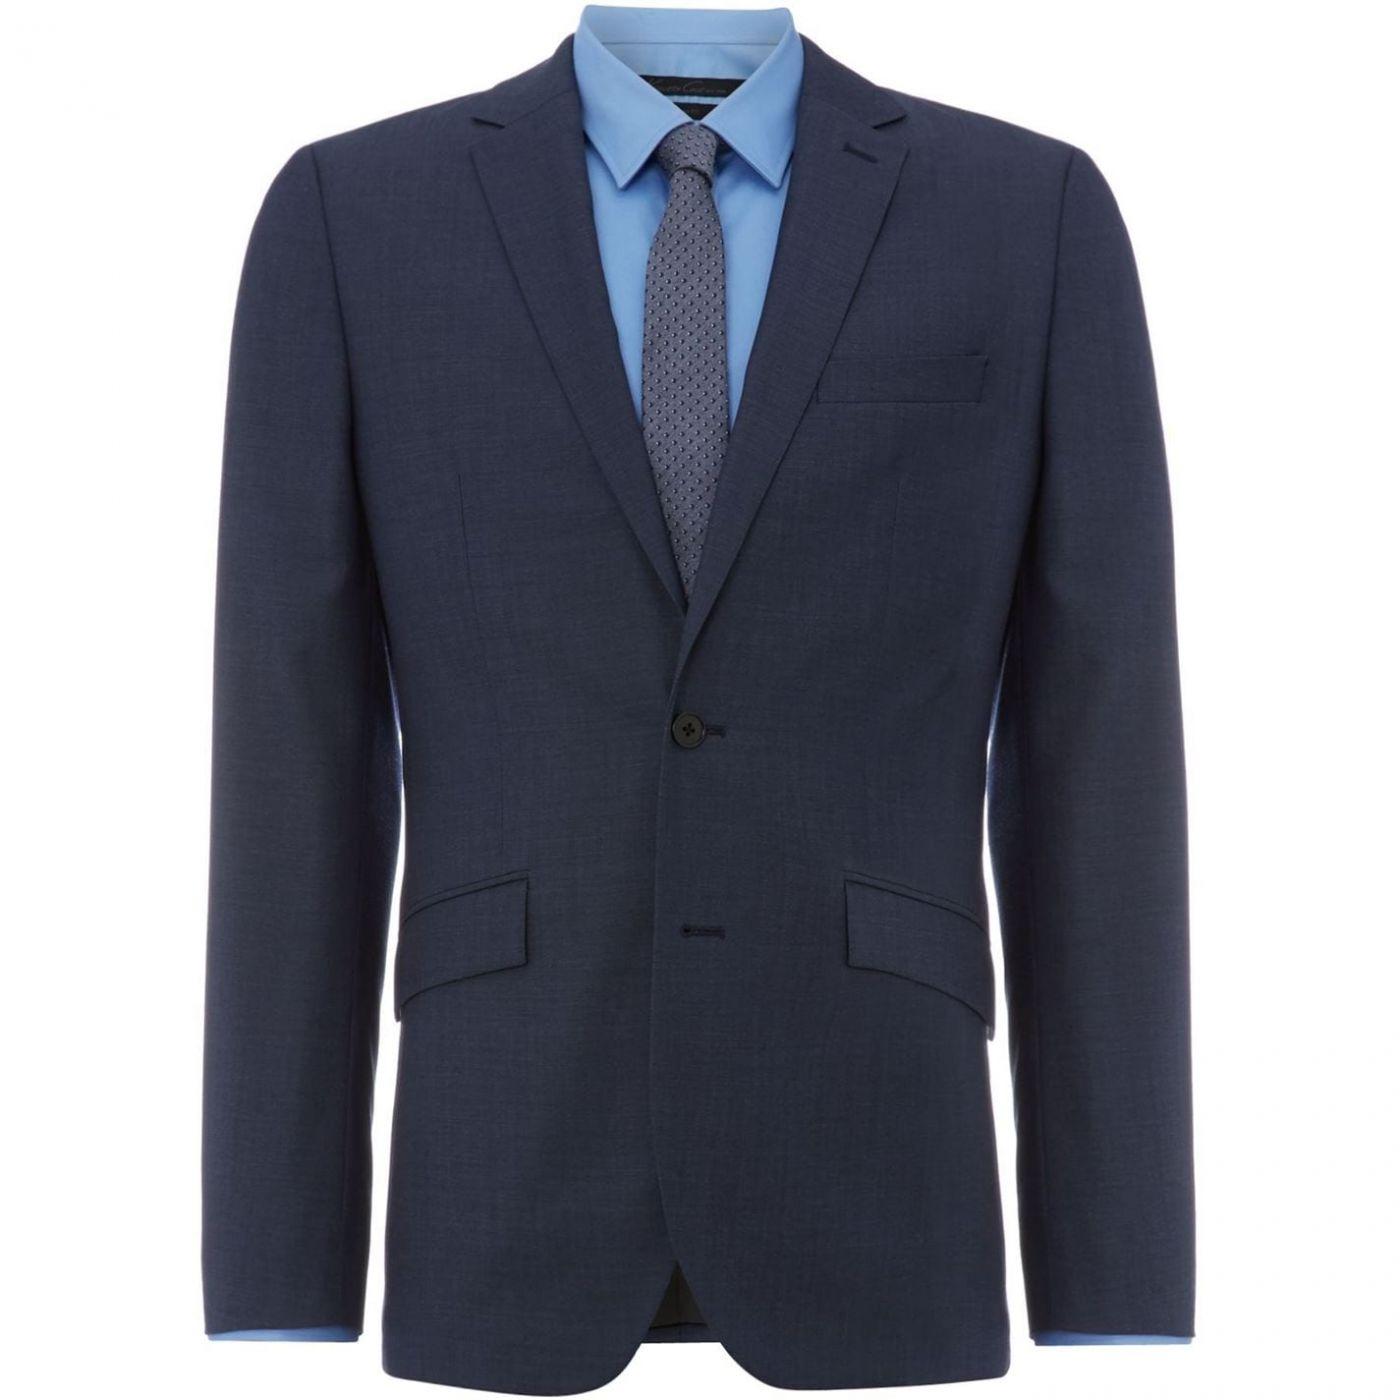 Kenneth Cole Byram Twill Travel Suit Jacket